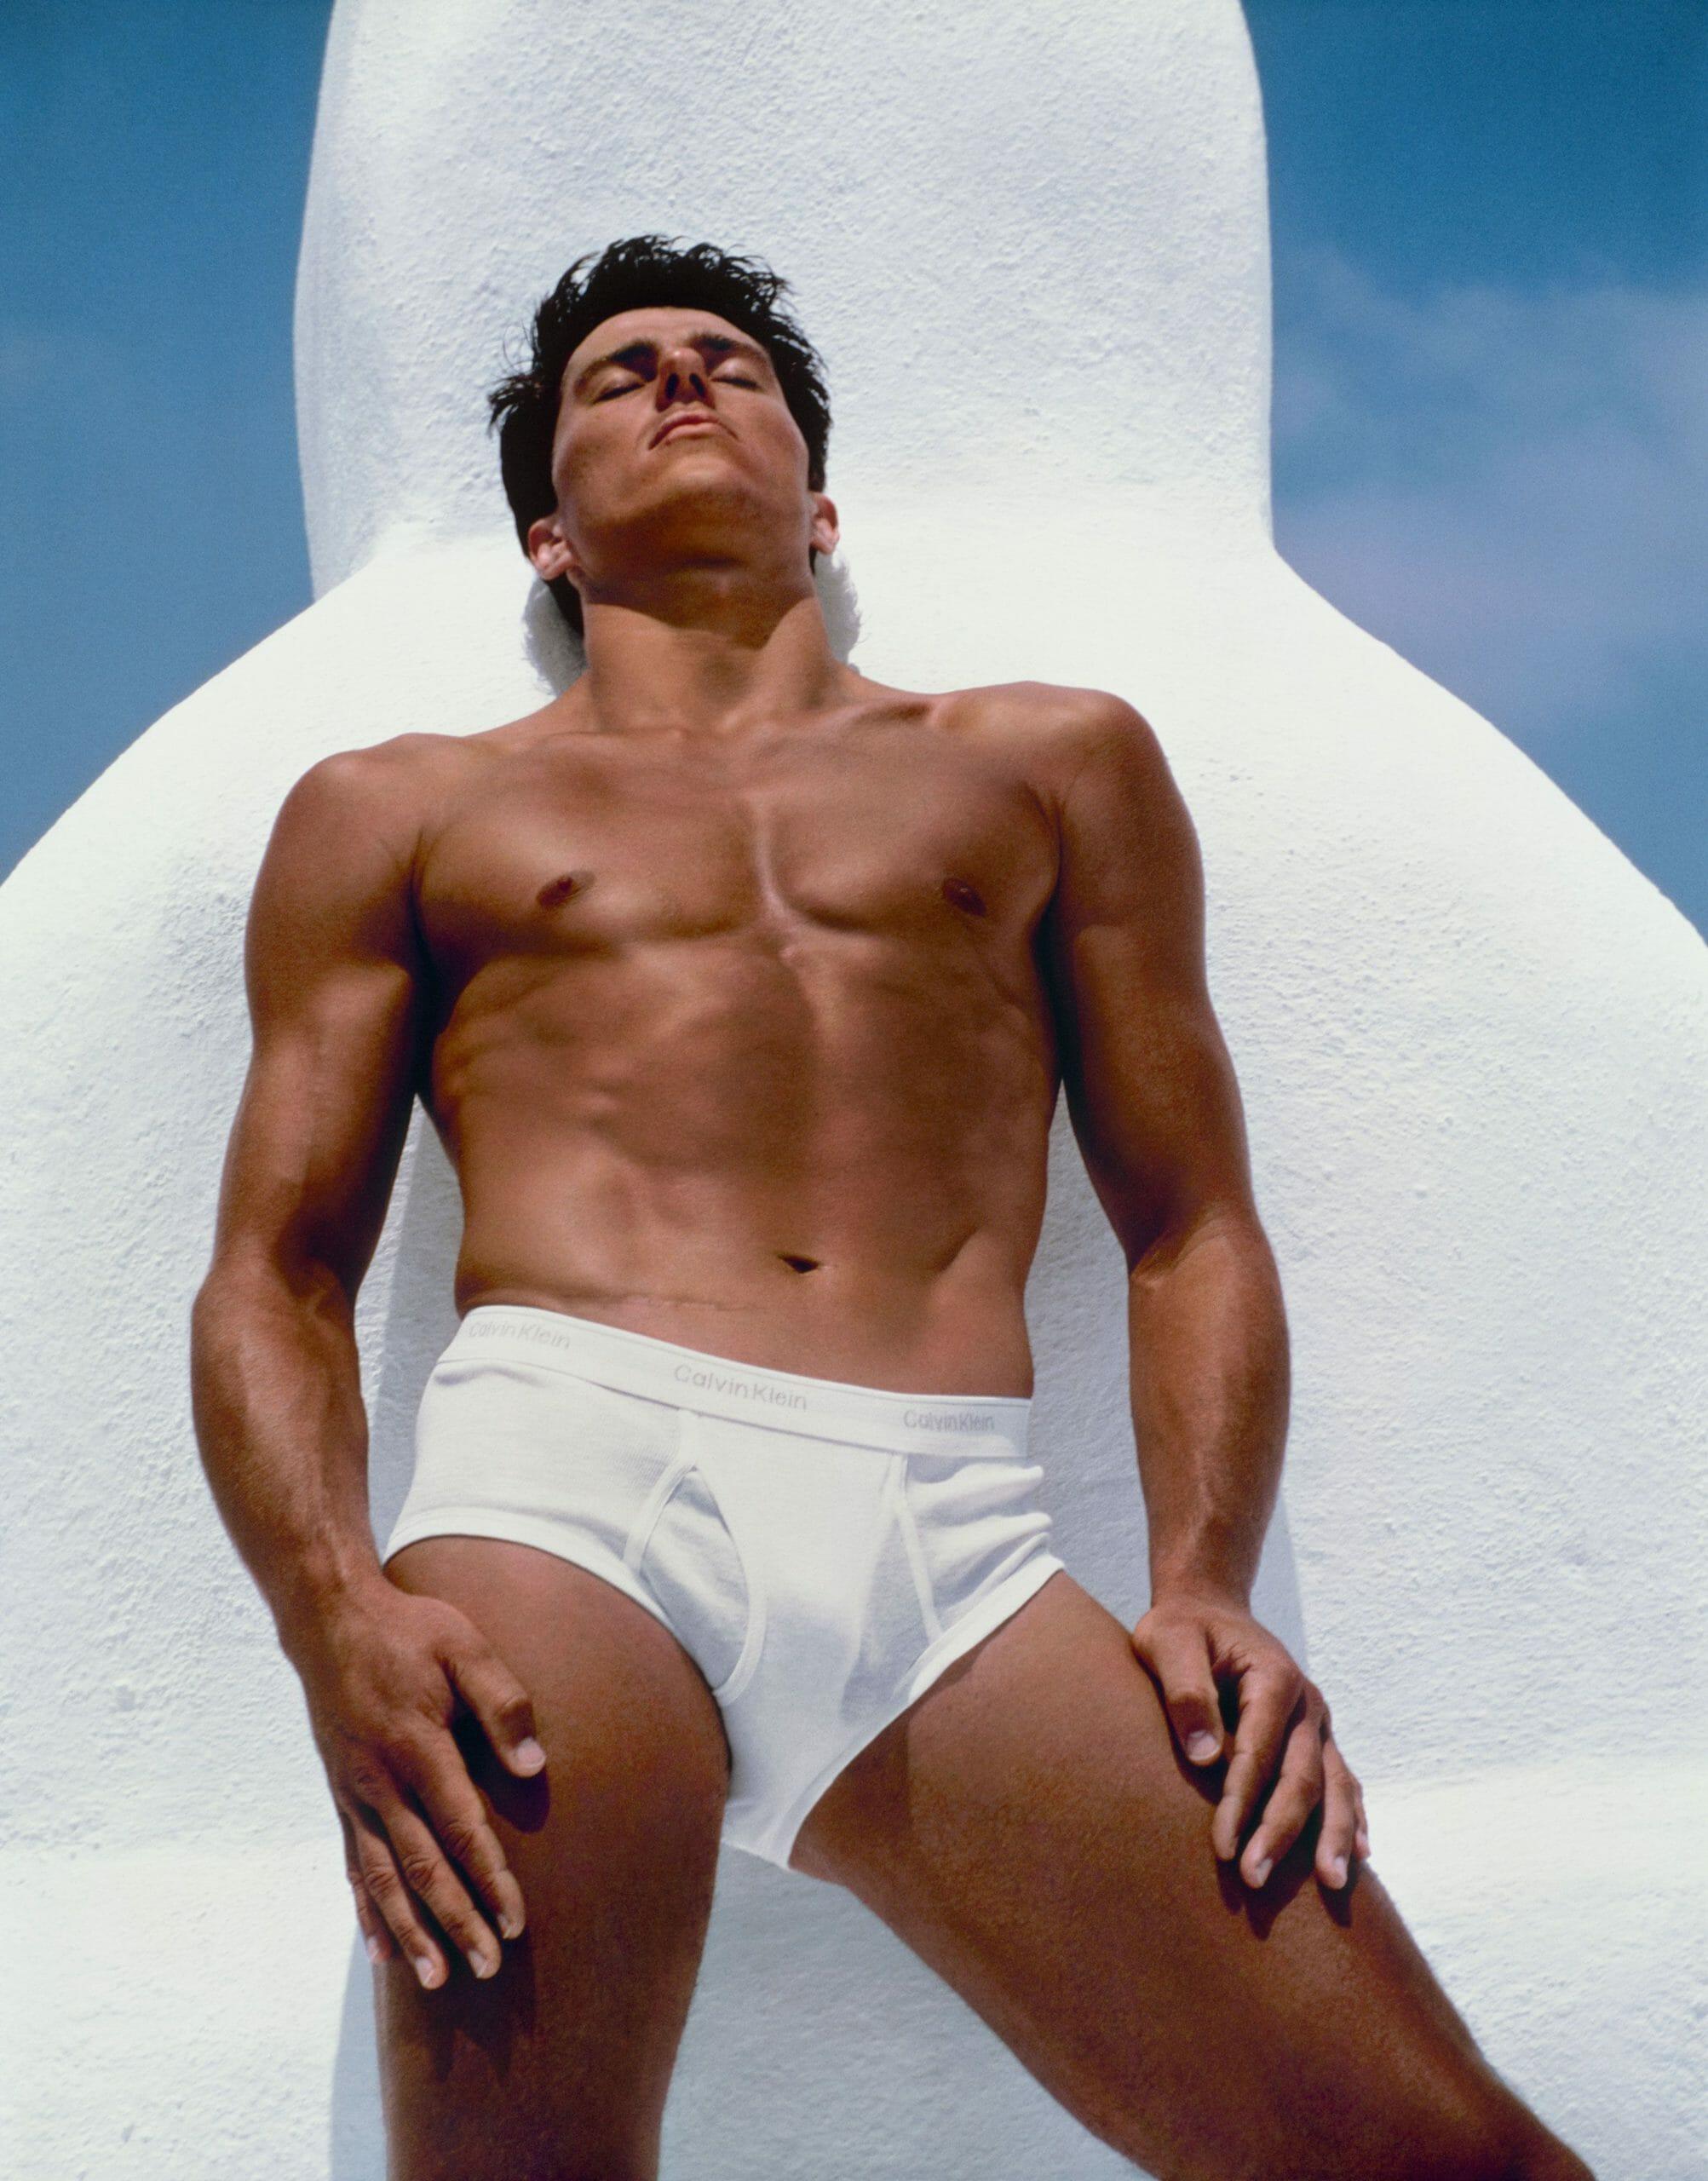 Bronzed muscular man in underwear sunbathing LGBTQ+ photography